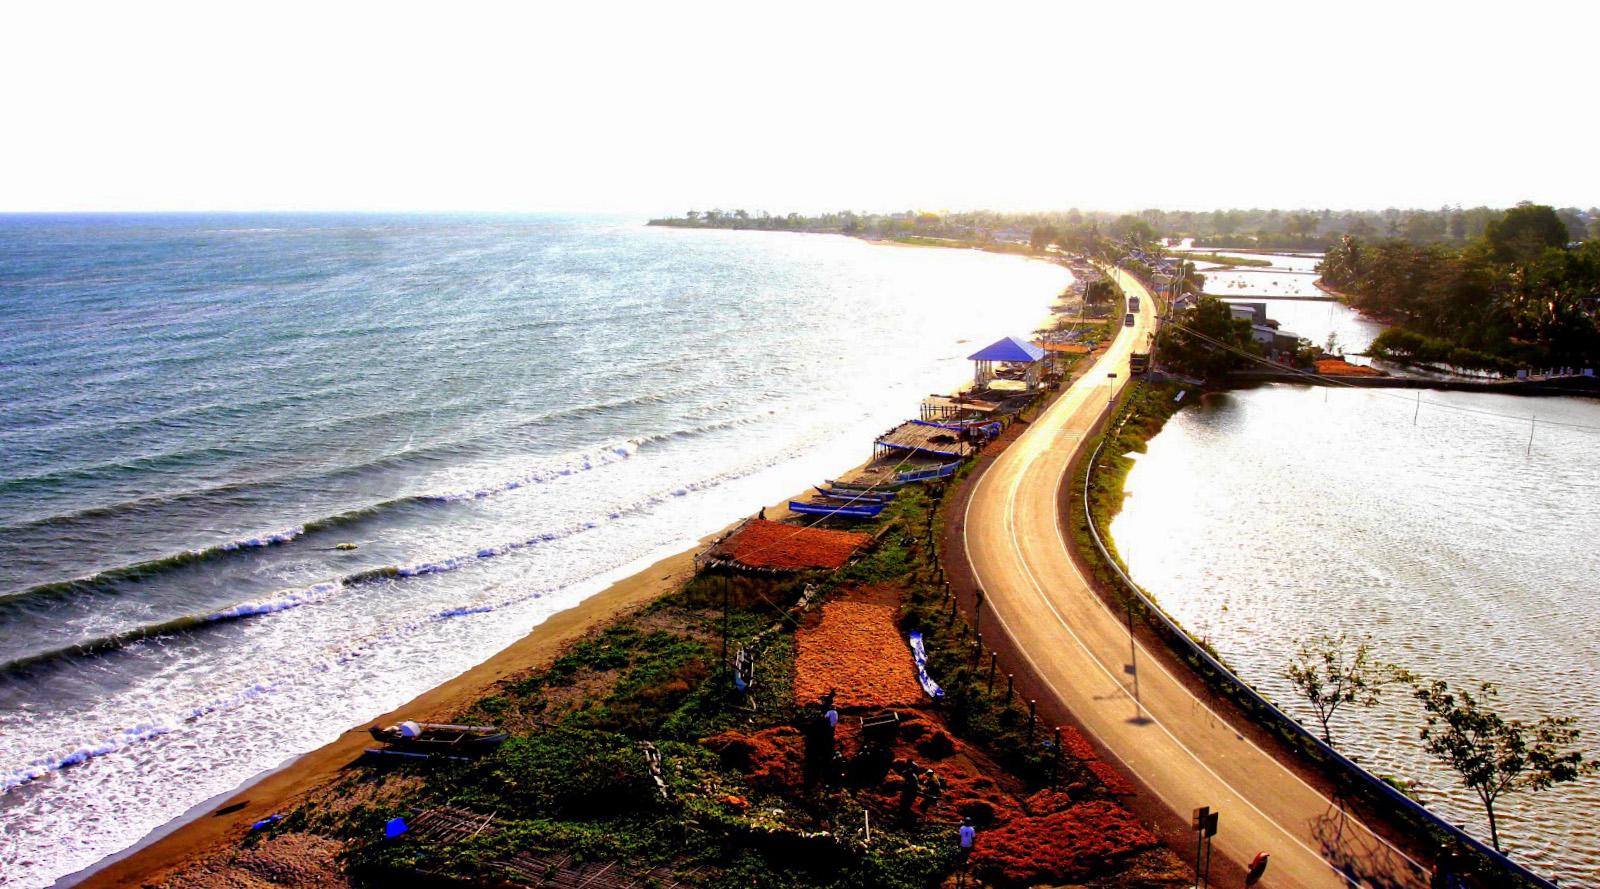 pantai tanjung makassar marina wisata indonesia cantik dan manis